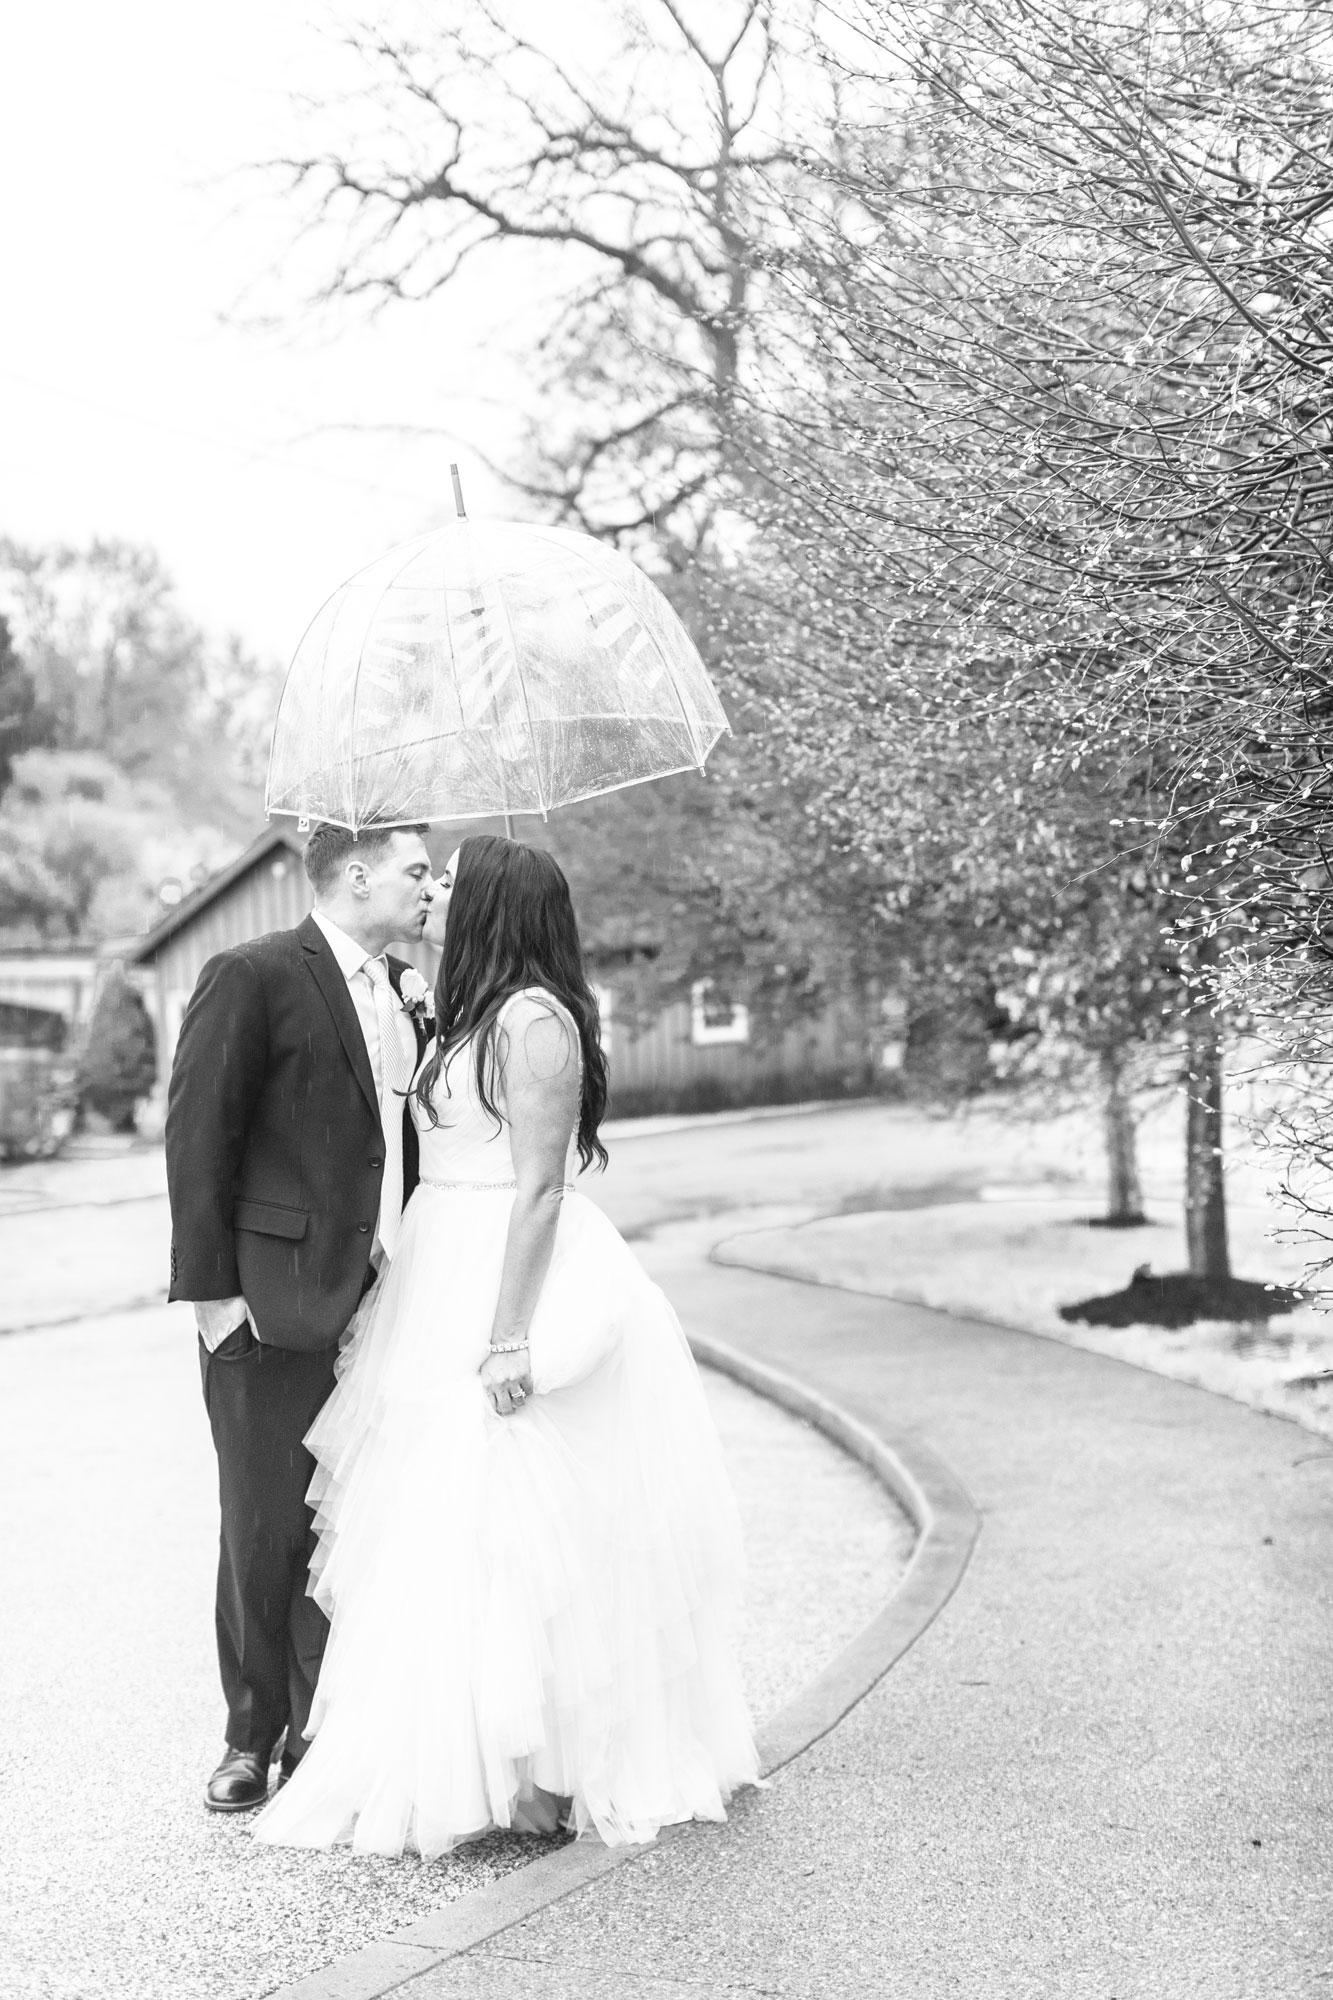 Konz-Bigaila-wedding-2017-128.jpg